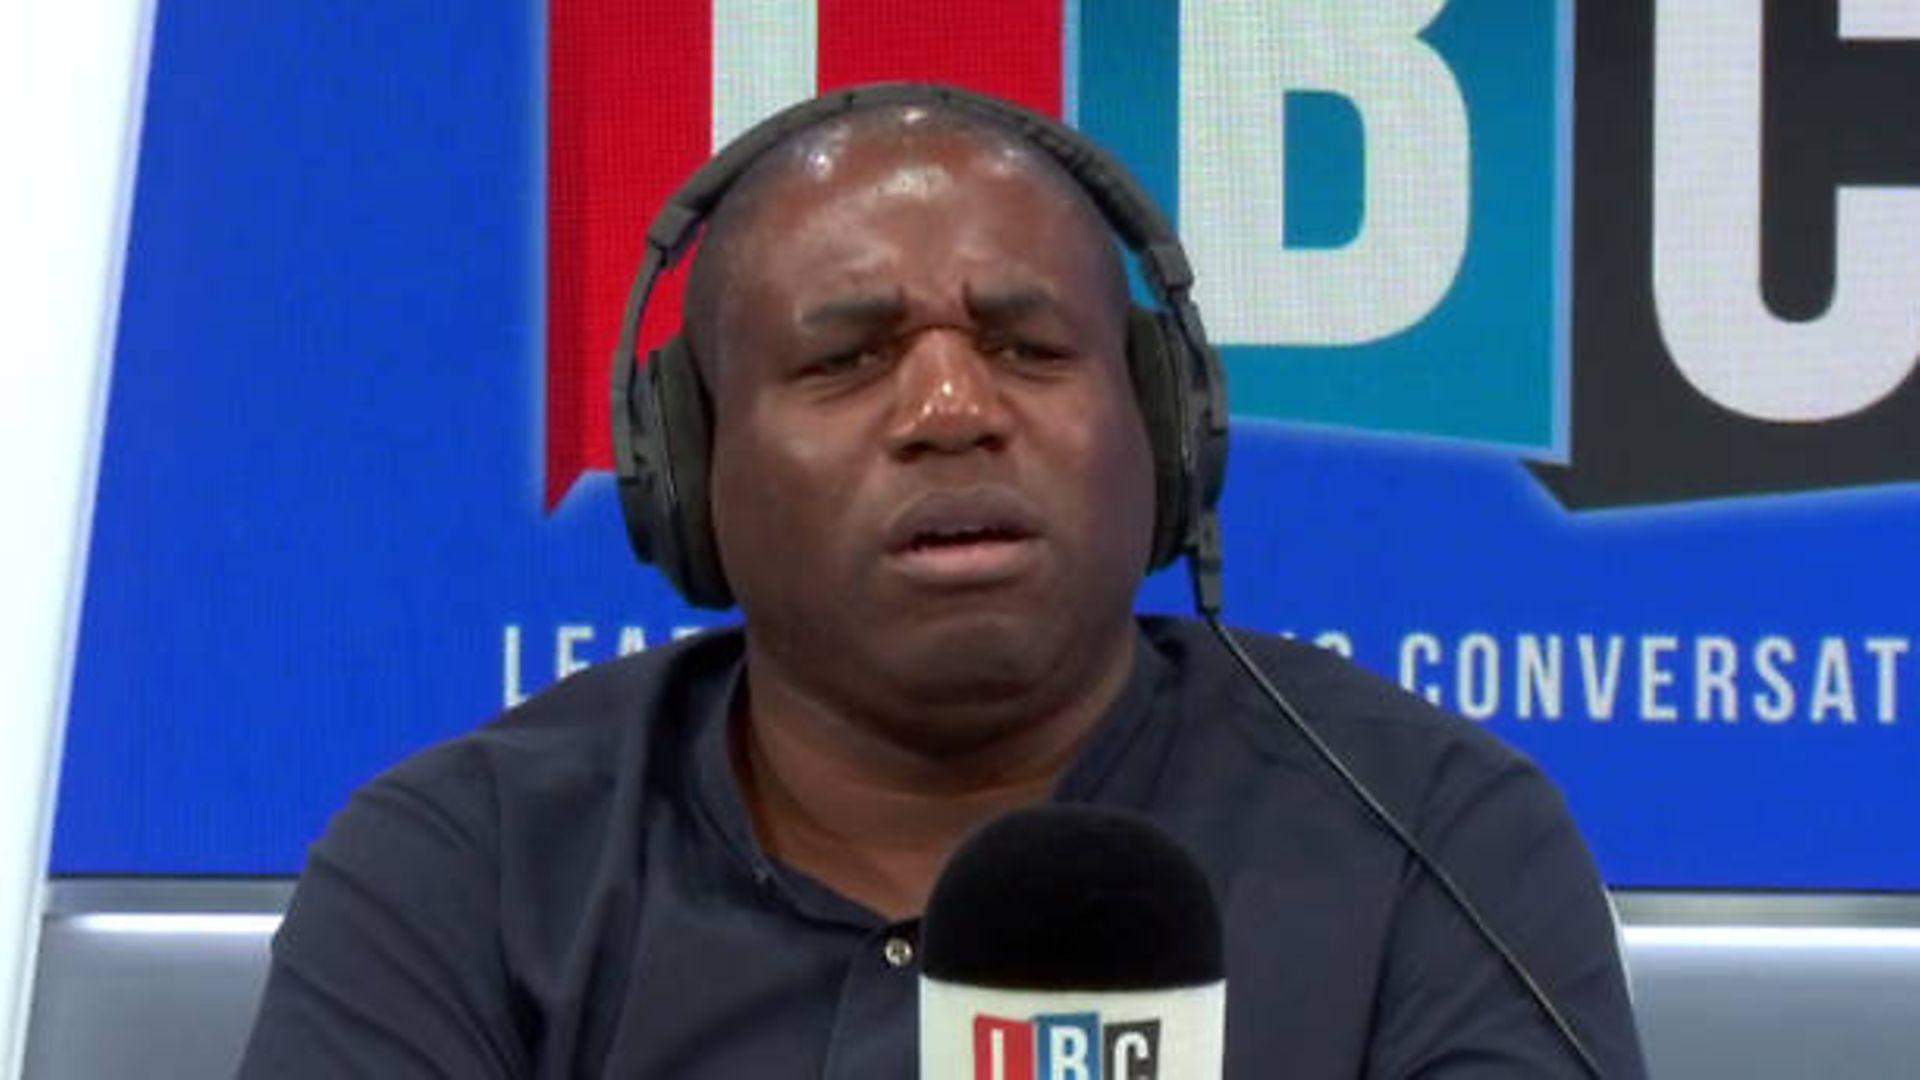 David Lammy takes calls on his LBC Radio show - Credit: LBC